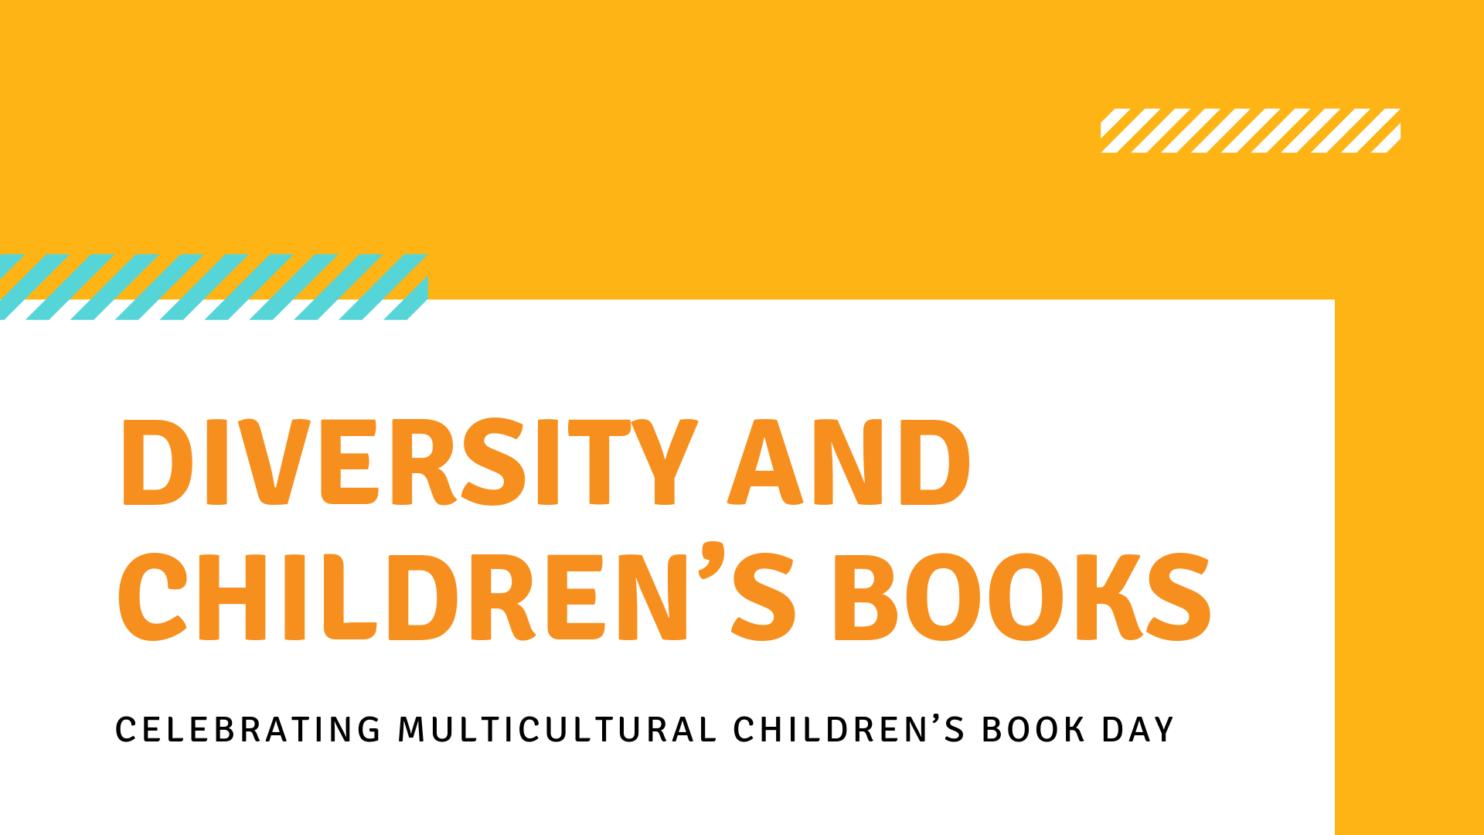 Diversity and Children's Books